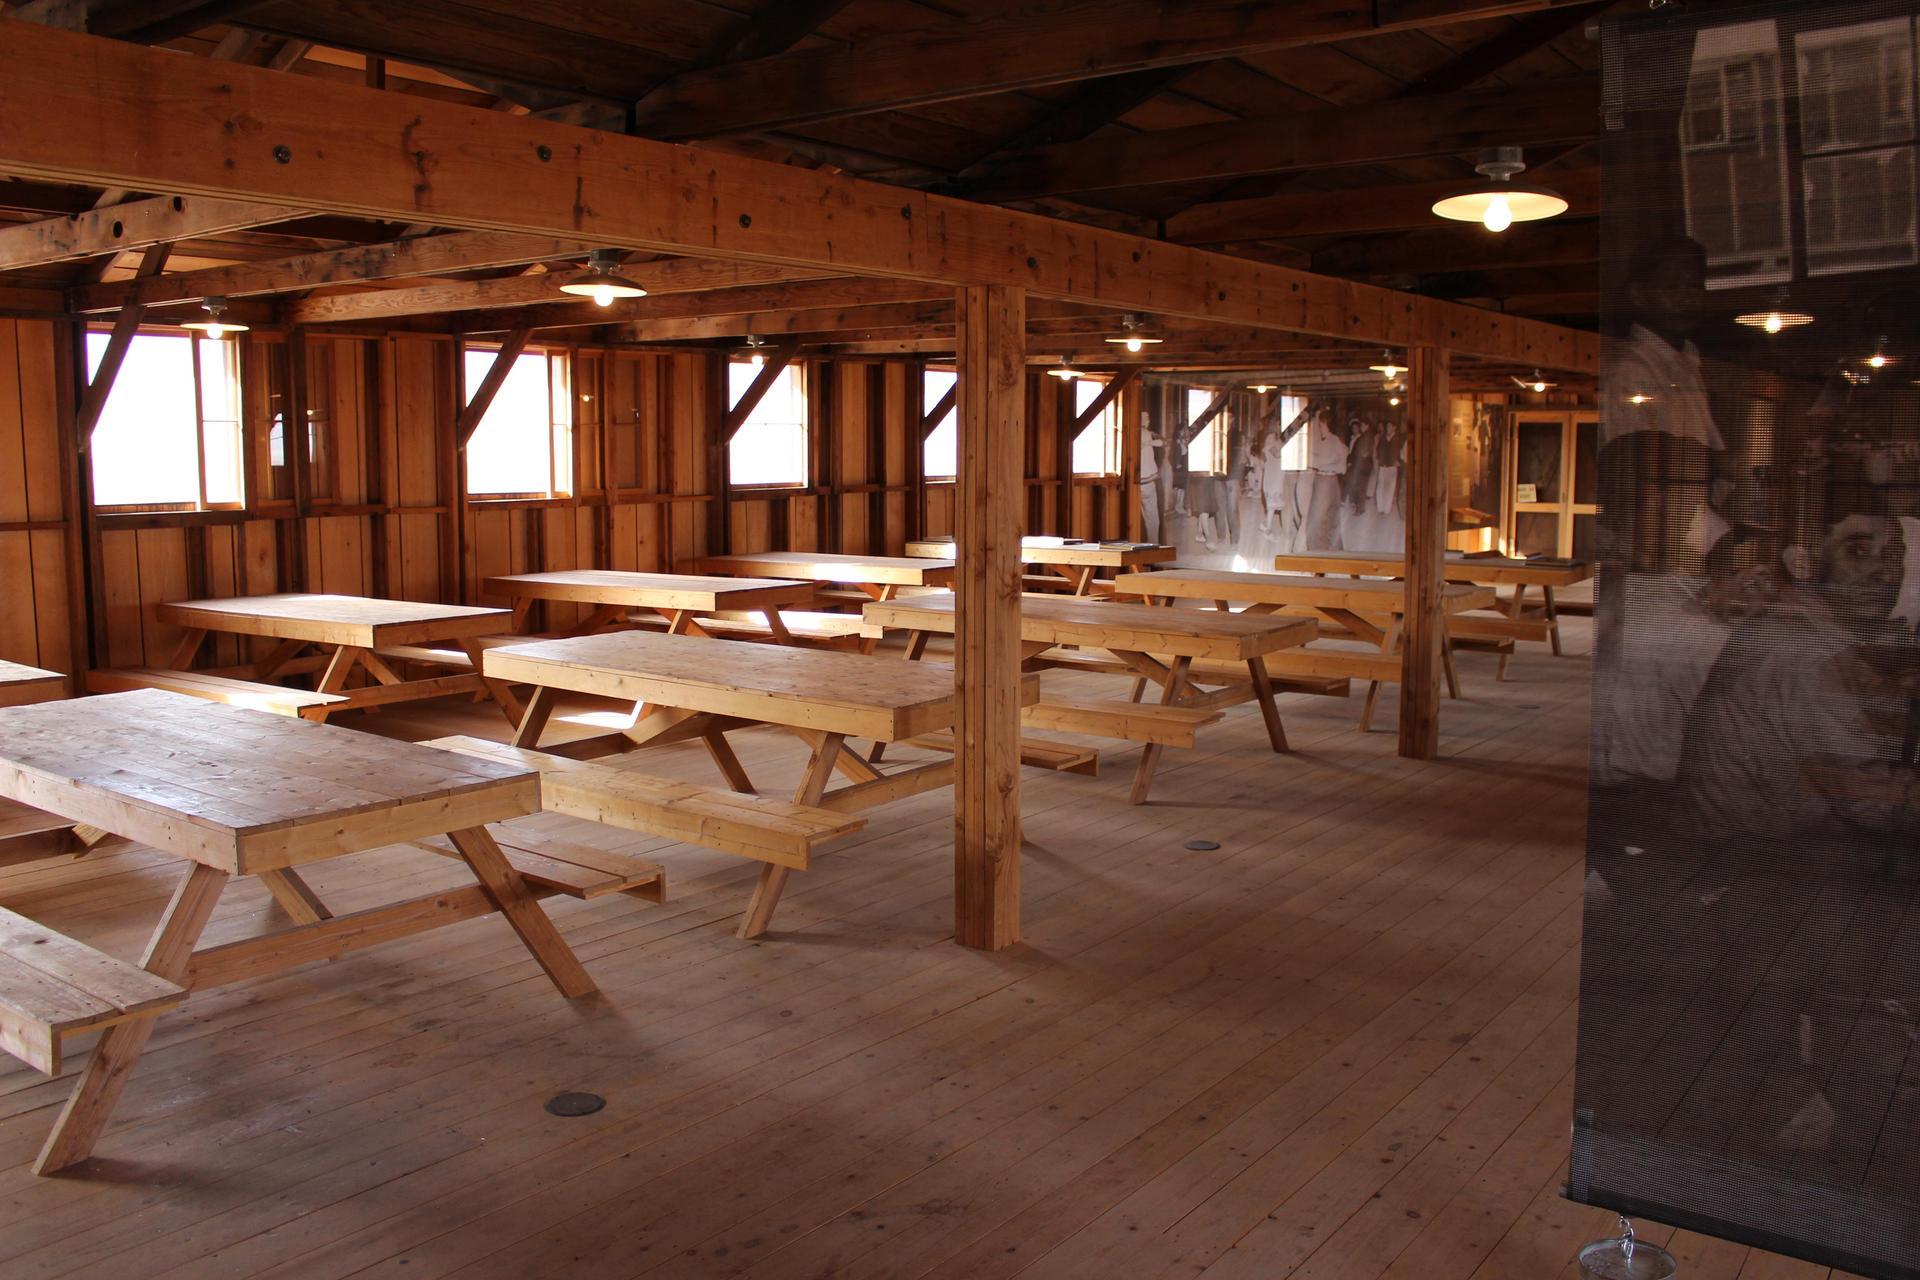 Manzanar Eating area